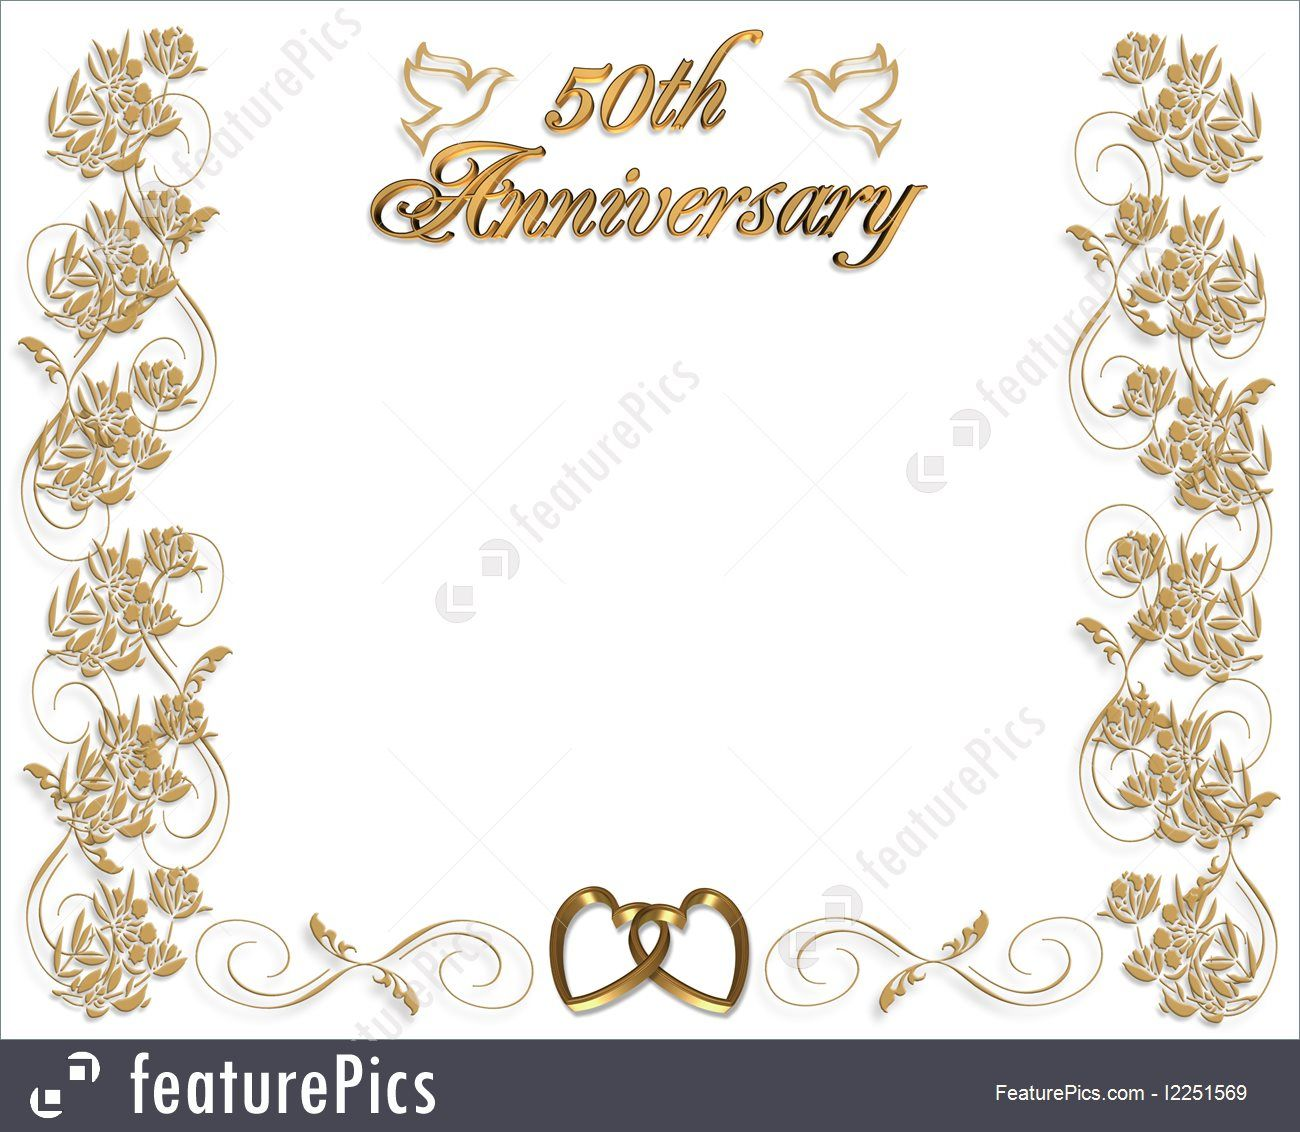 Wedding Invitation Template 3d Illustrated Design For 50th Wedding A 50th Wedding Anniversary Invitations Anniversary Invitations 50th Anniversary Invitations